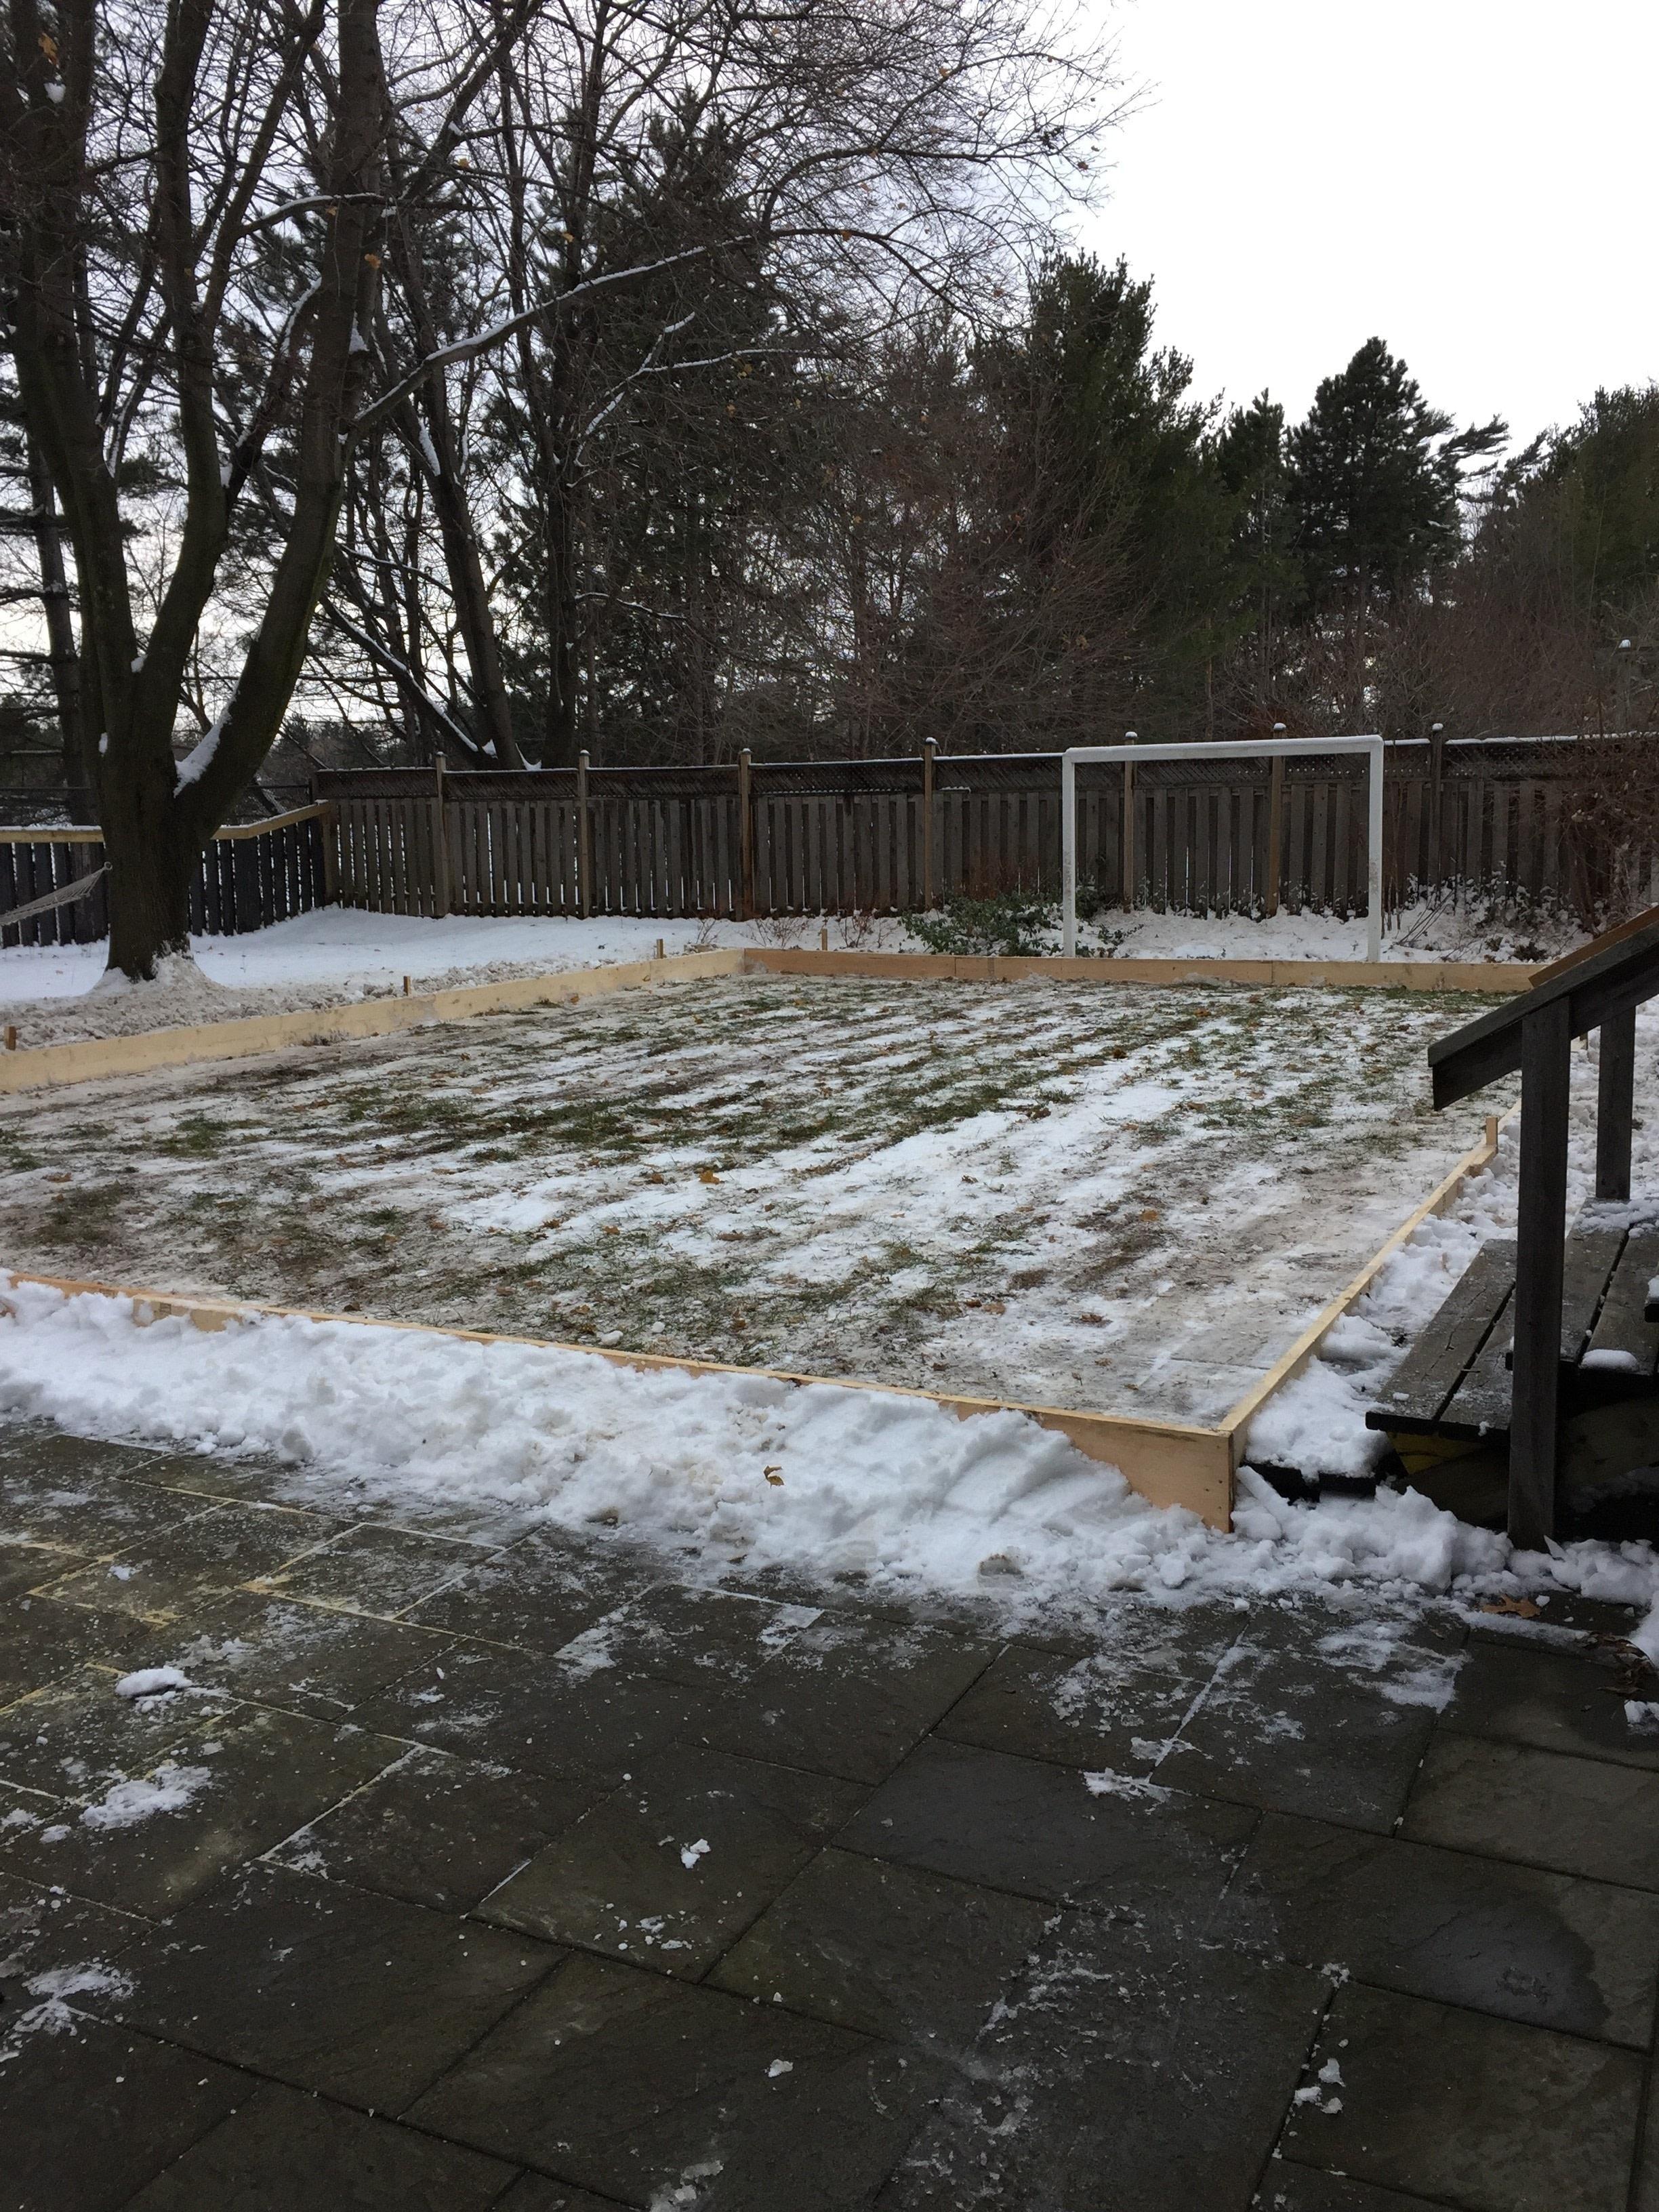 Diy Backyard Skating Rink · How To Make A Plushie Toy ...